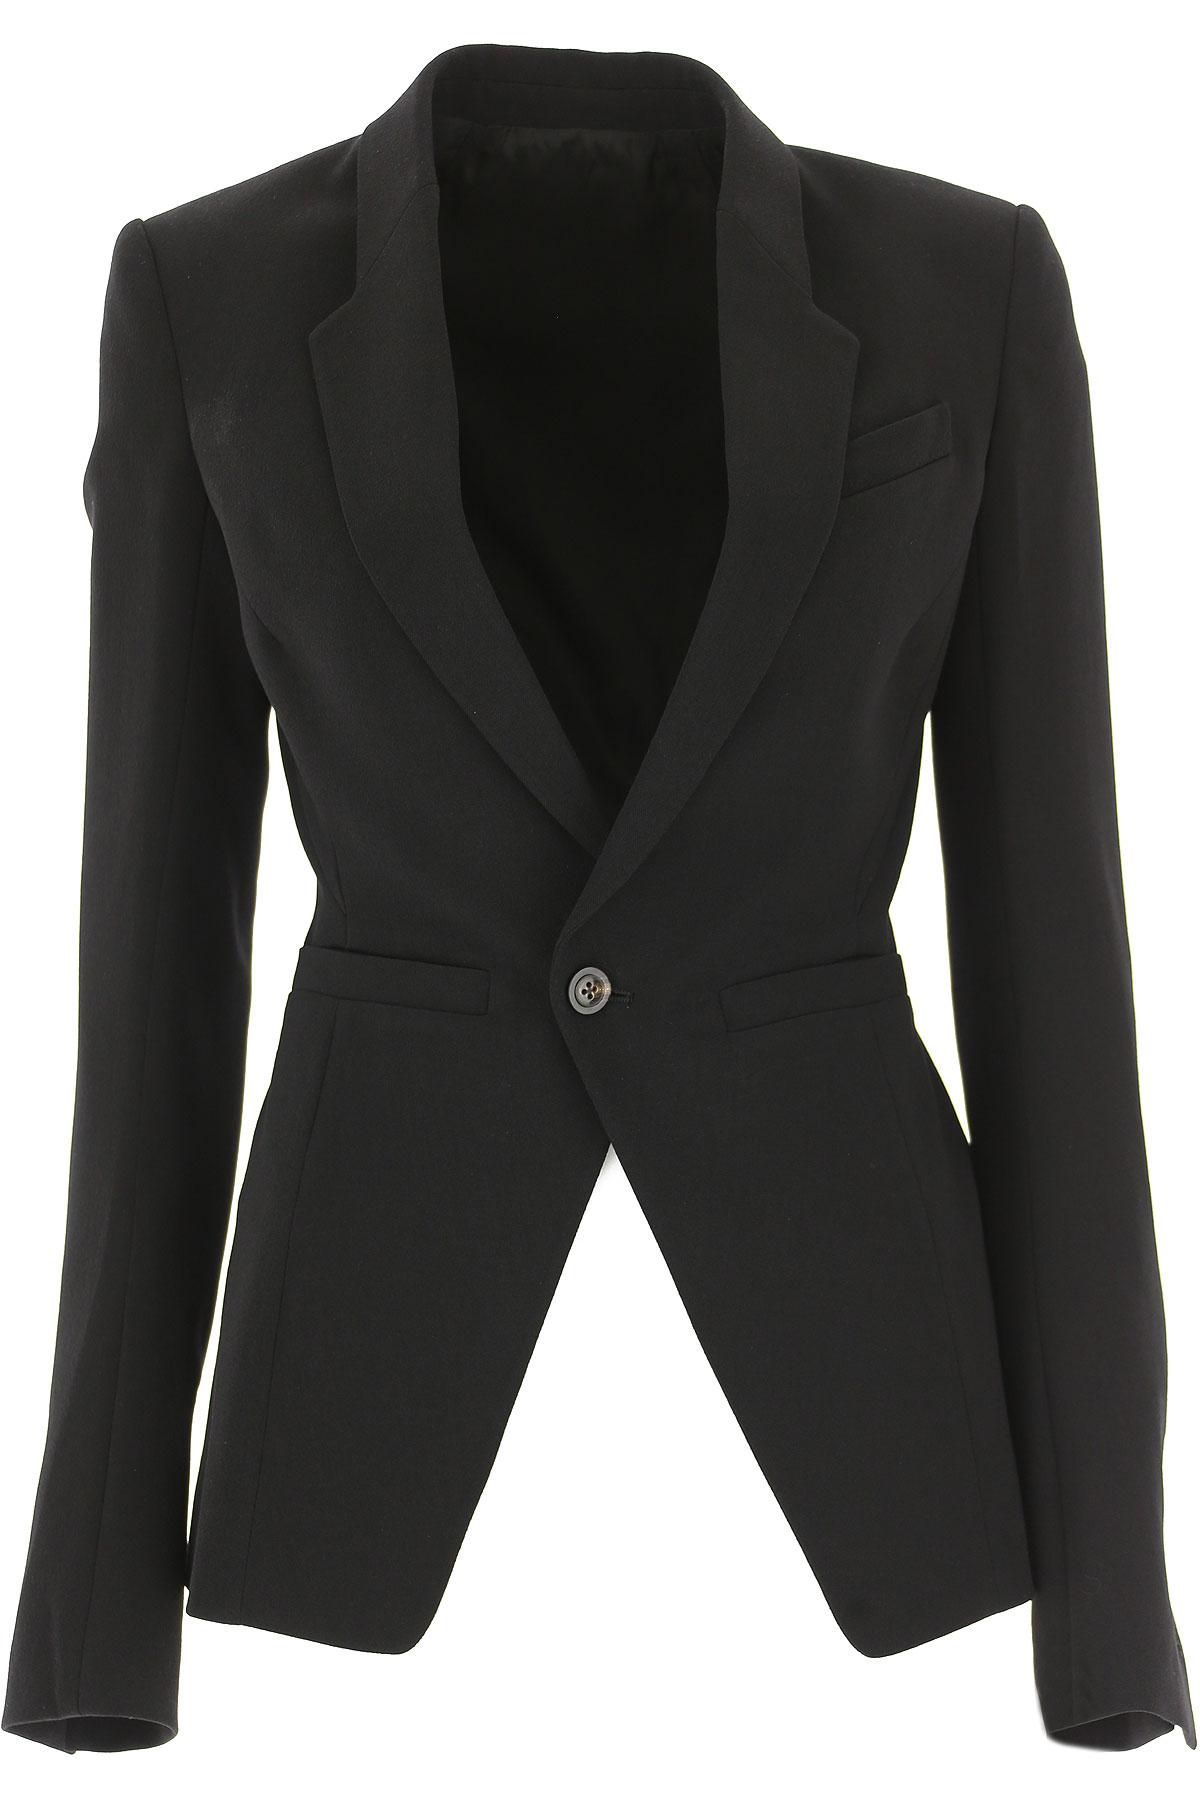 Image of Rick Owens Blazer for Women, Black, New Wool, 2017, 10 4 6 8